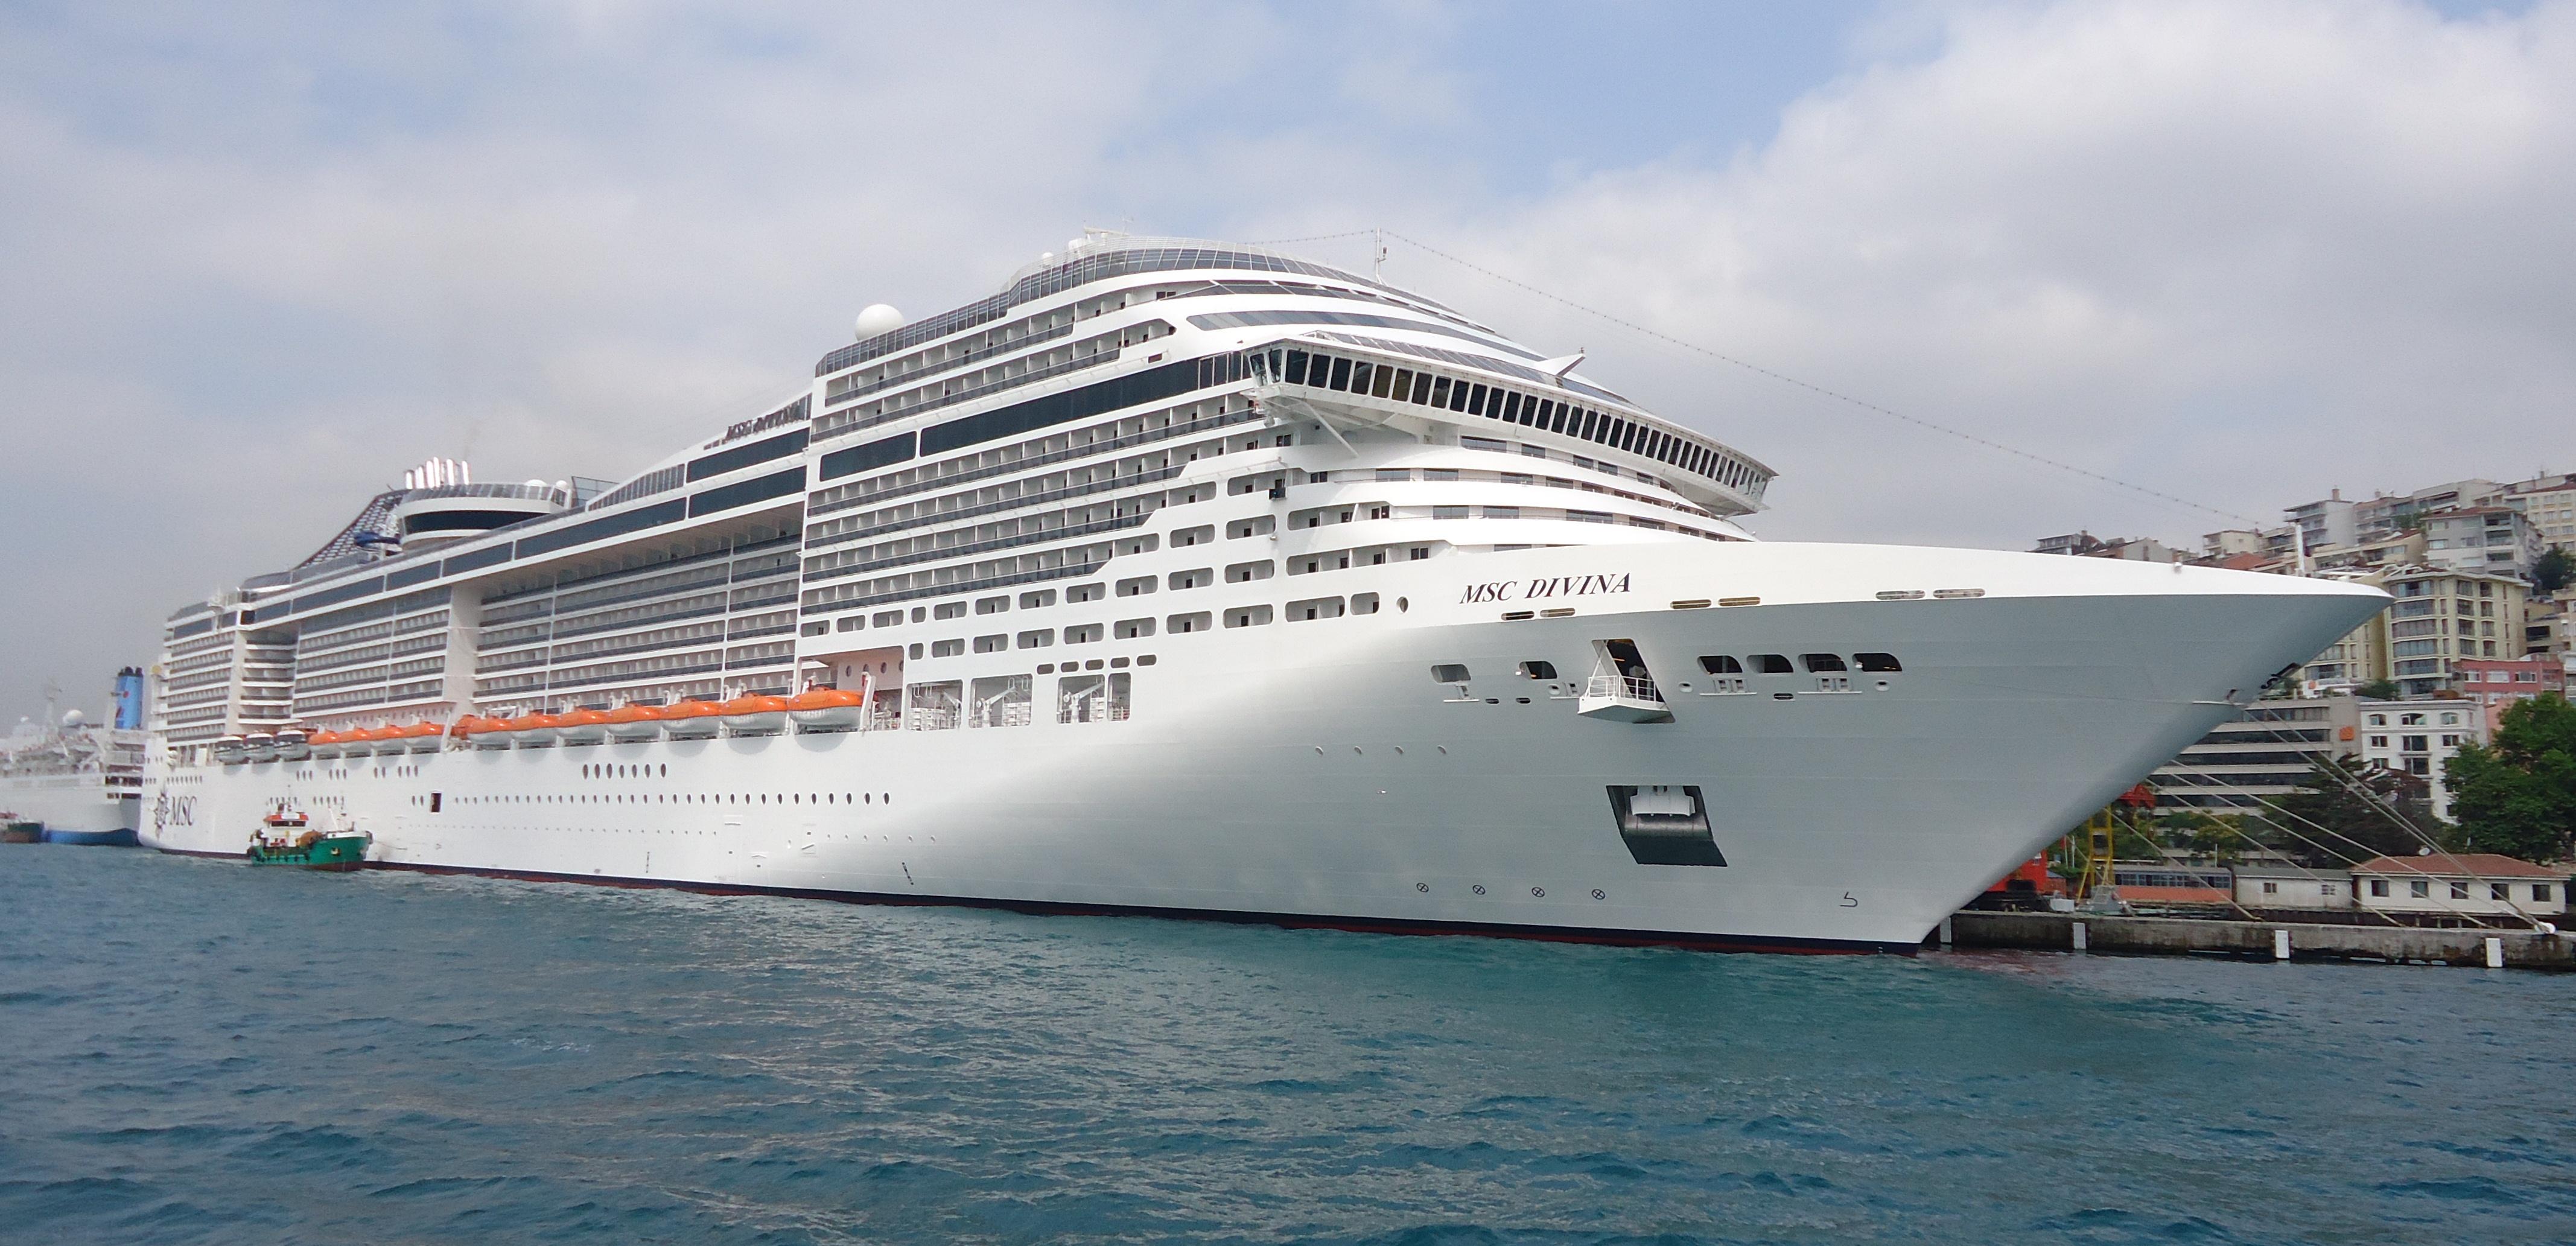 MSC Divina Wikipedia - Msc divina cruise ship